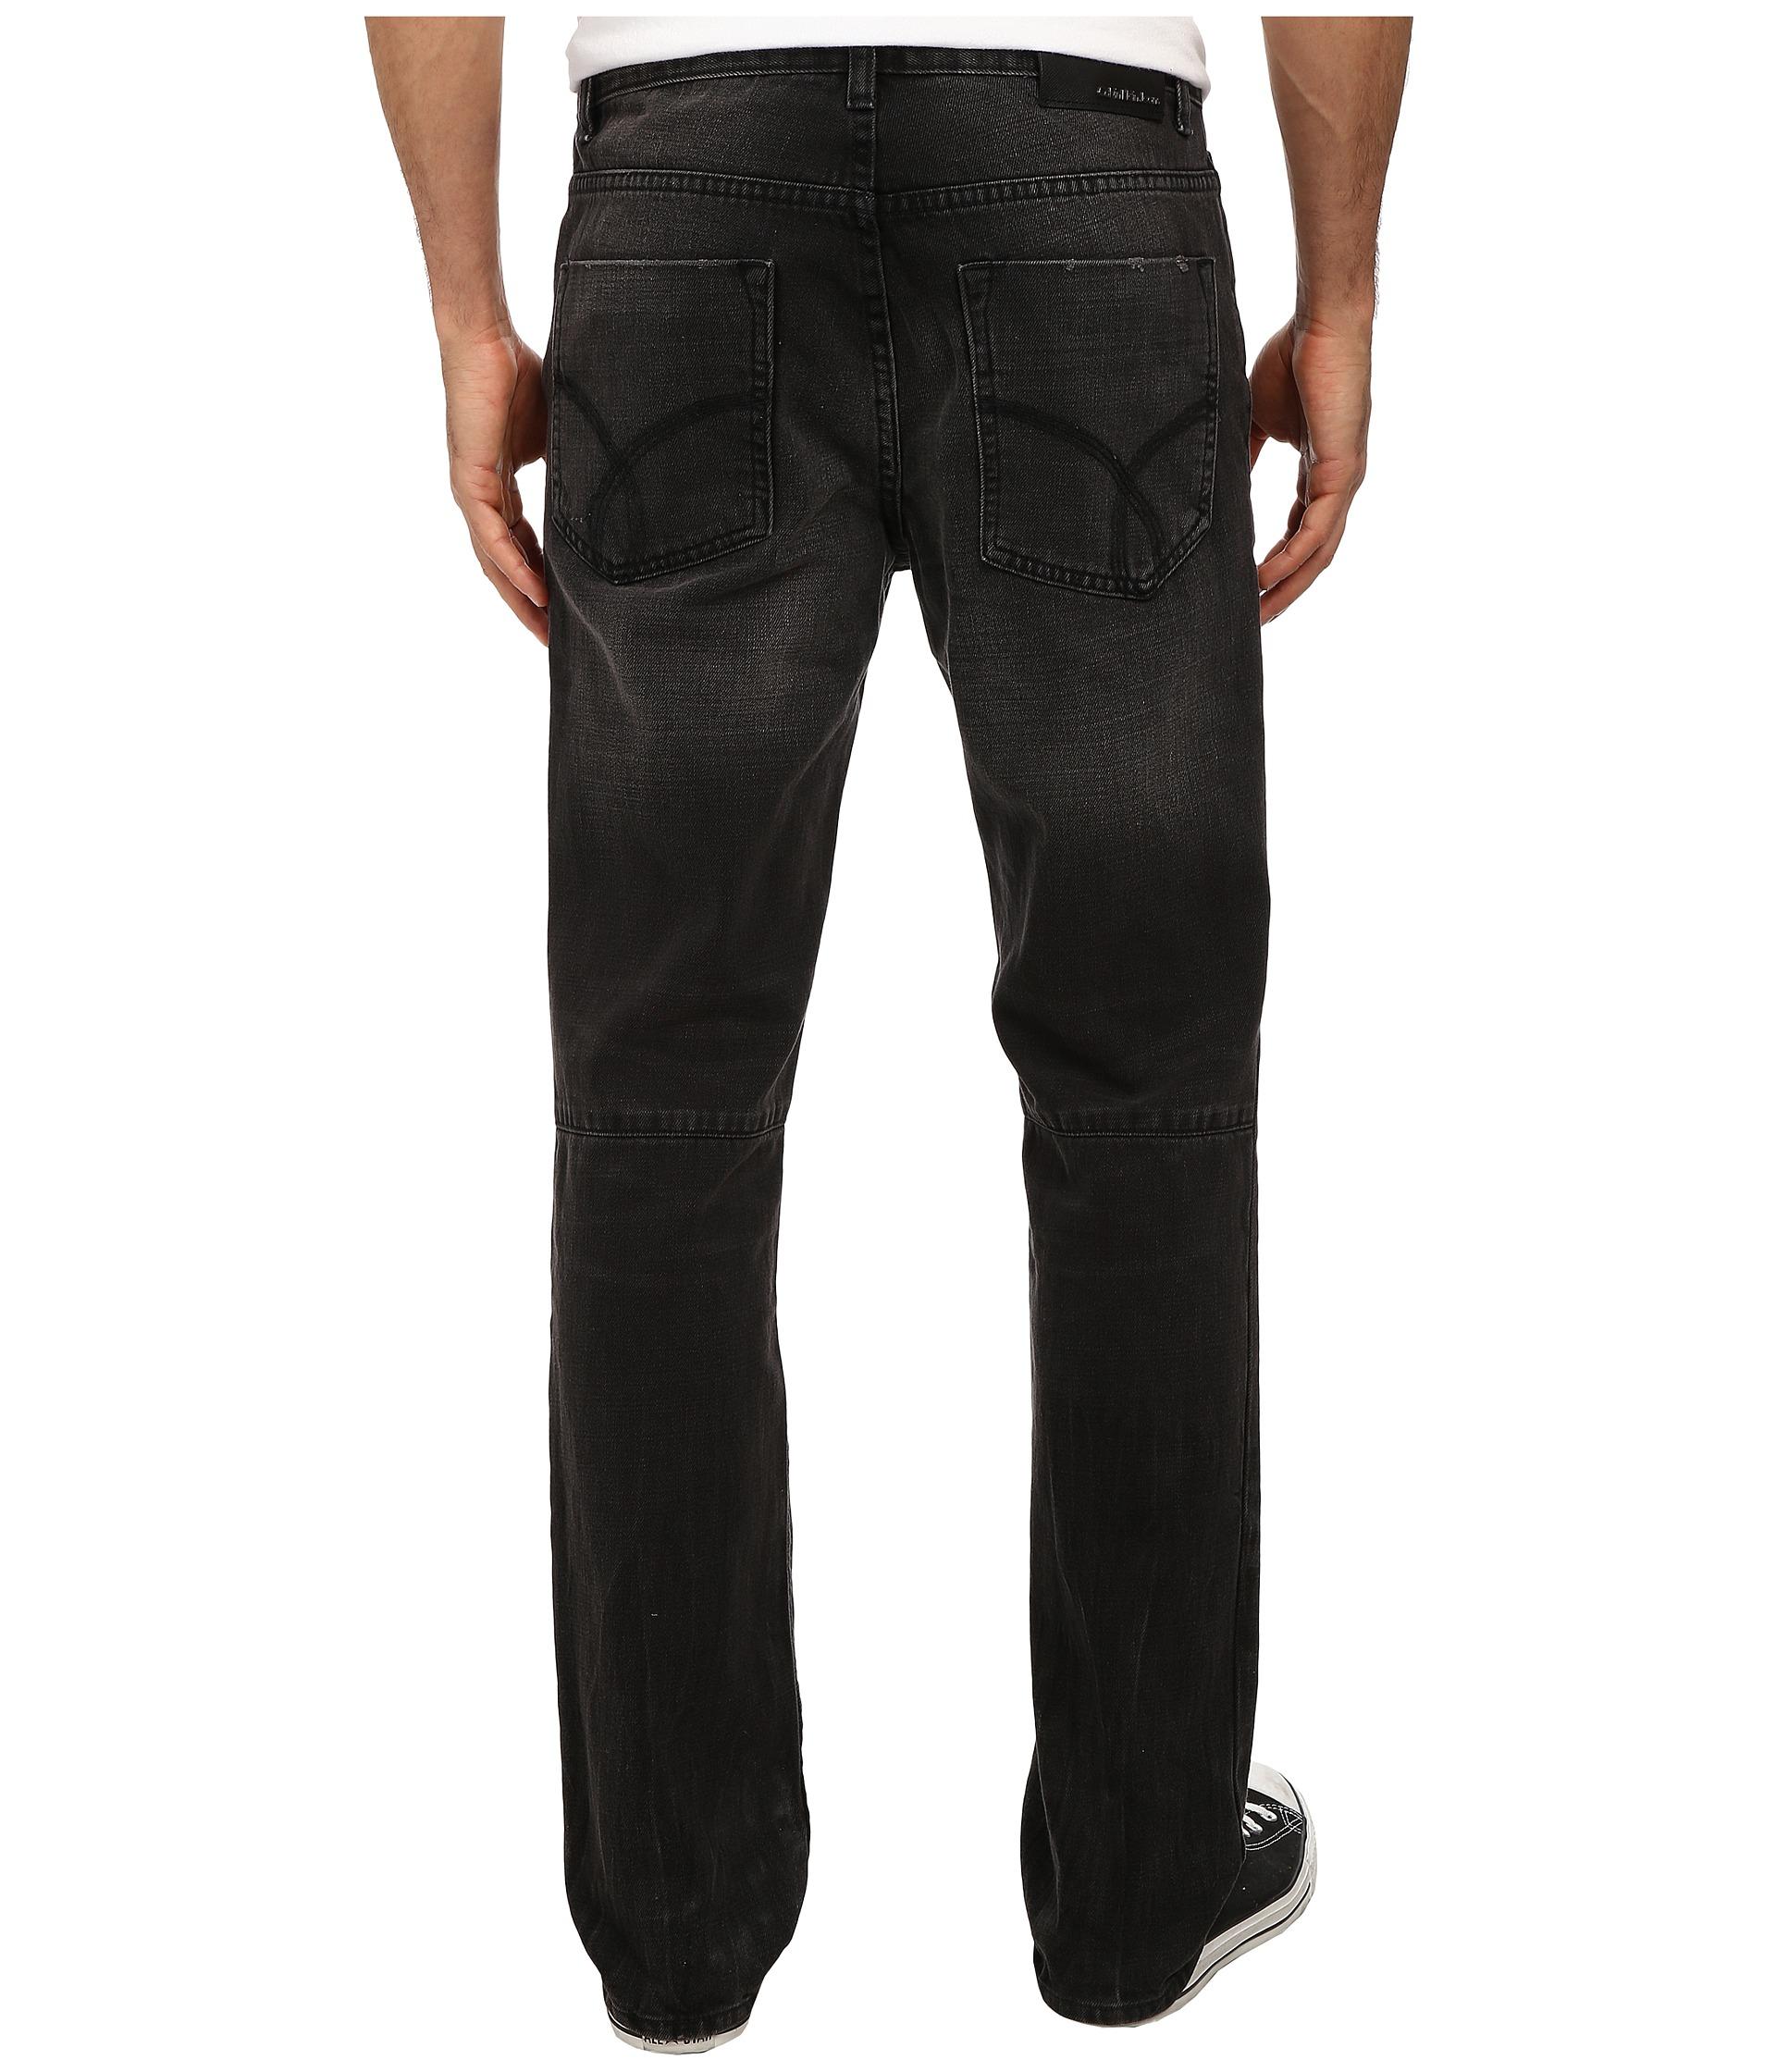 Outseam Measurement Calvin klein jeans Sli...